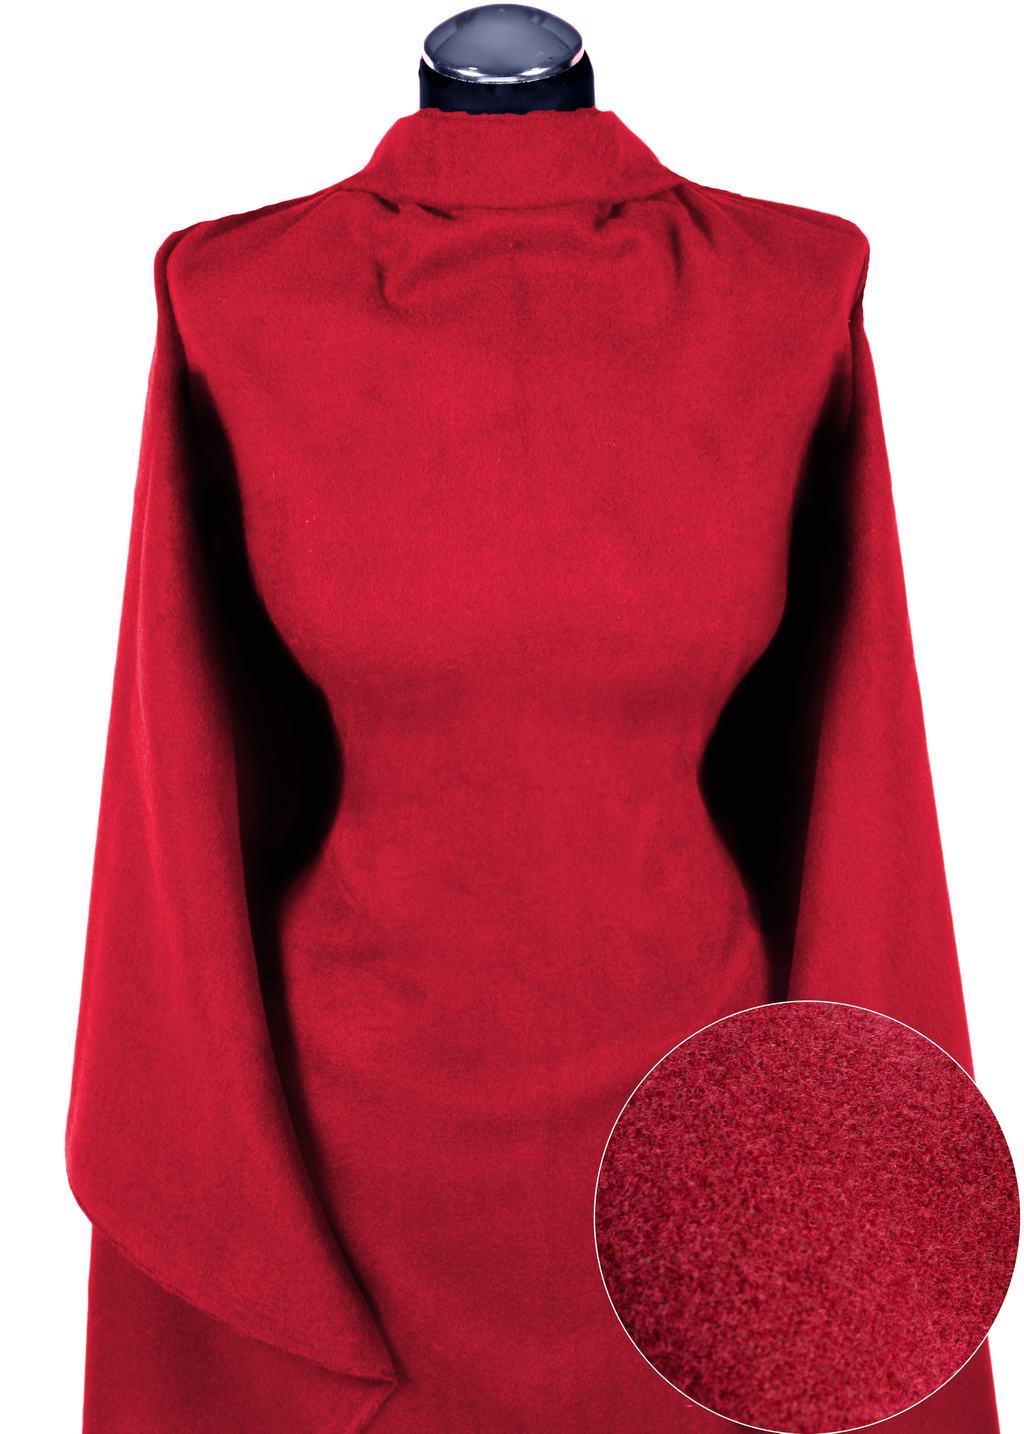 Flauš 08 červený  FL08    Galantéria PONČÍK - eshop - metrový textil ... 61f931c1f5c